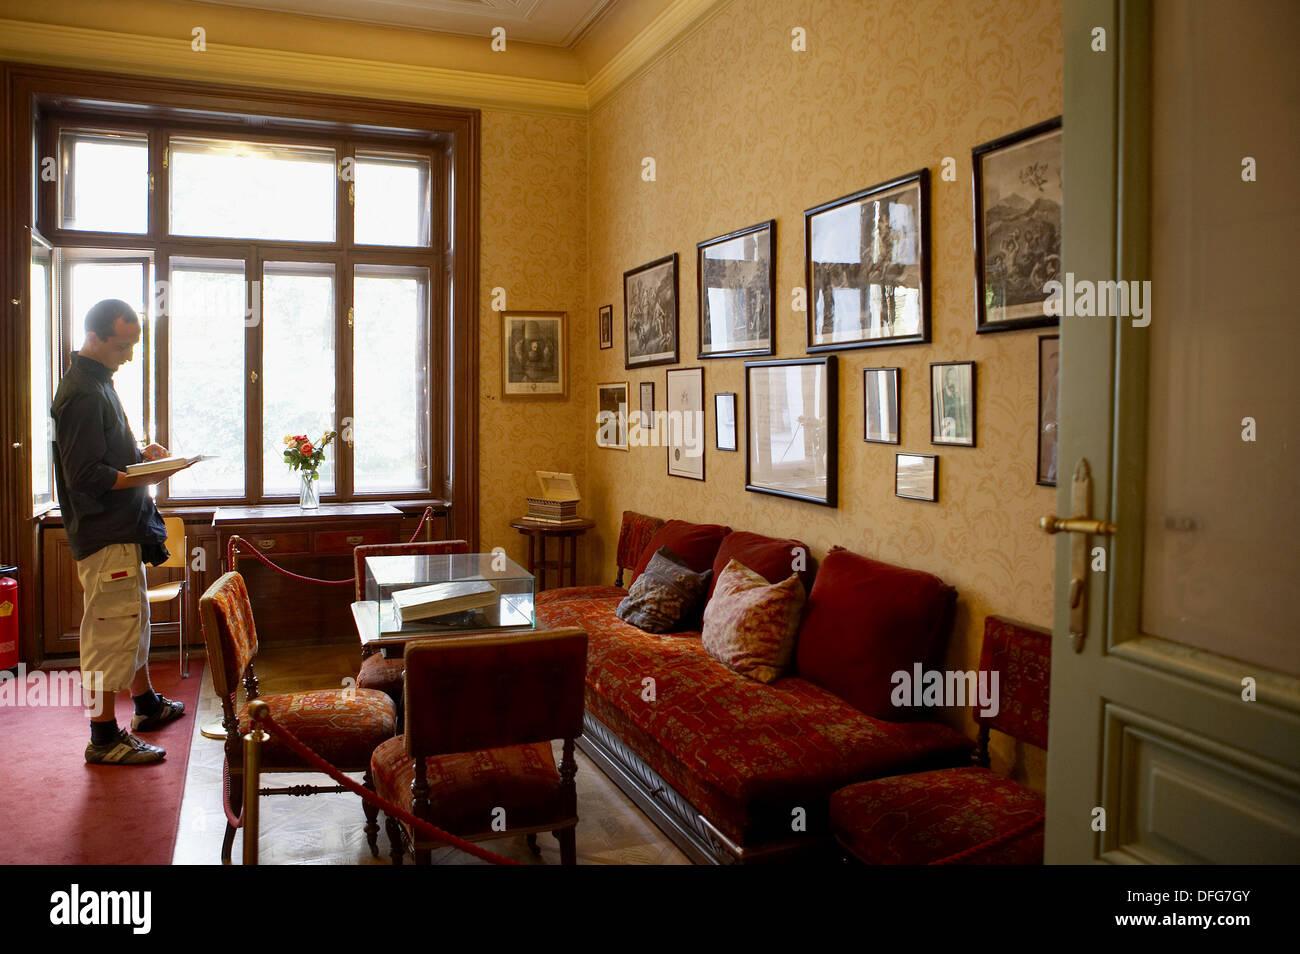 Sigmund Freud Museum, Vienna,  Austria - Stock Image